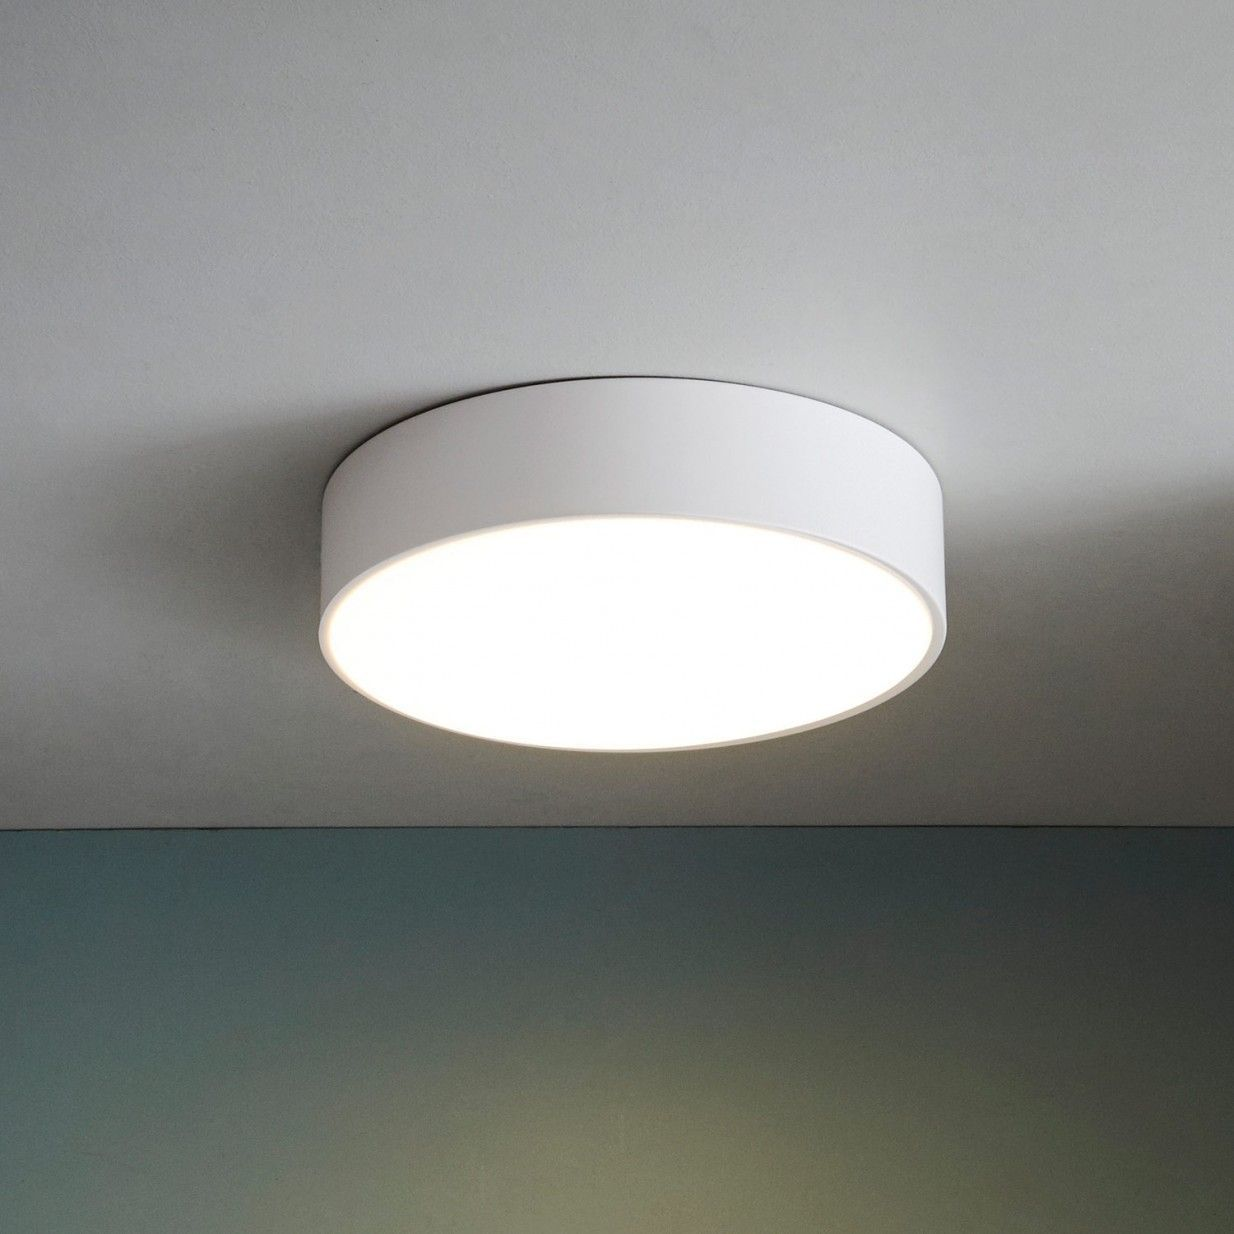 Unique Dekoration Wand Flur Ideen Für Das Wohndesign: Lampen Haus. Trendy Groe Lampen Groe Lampen Haus Ideen